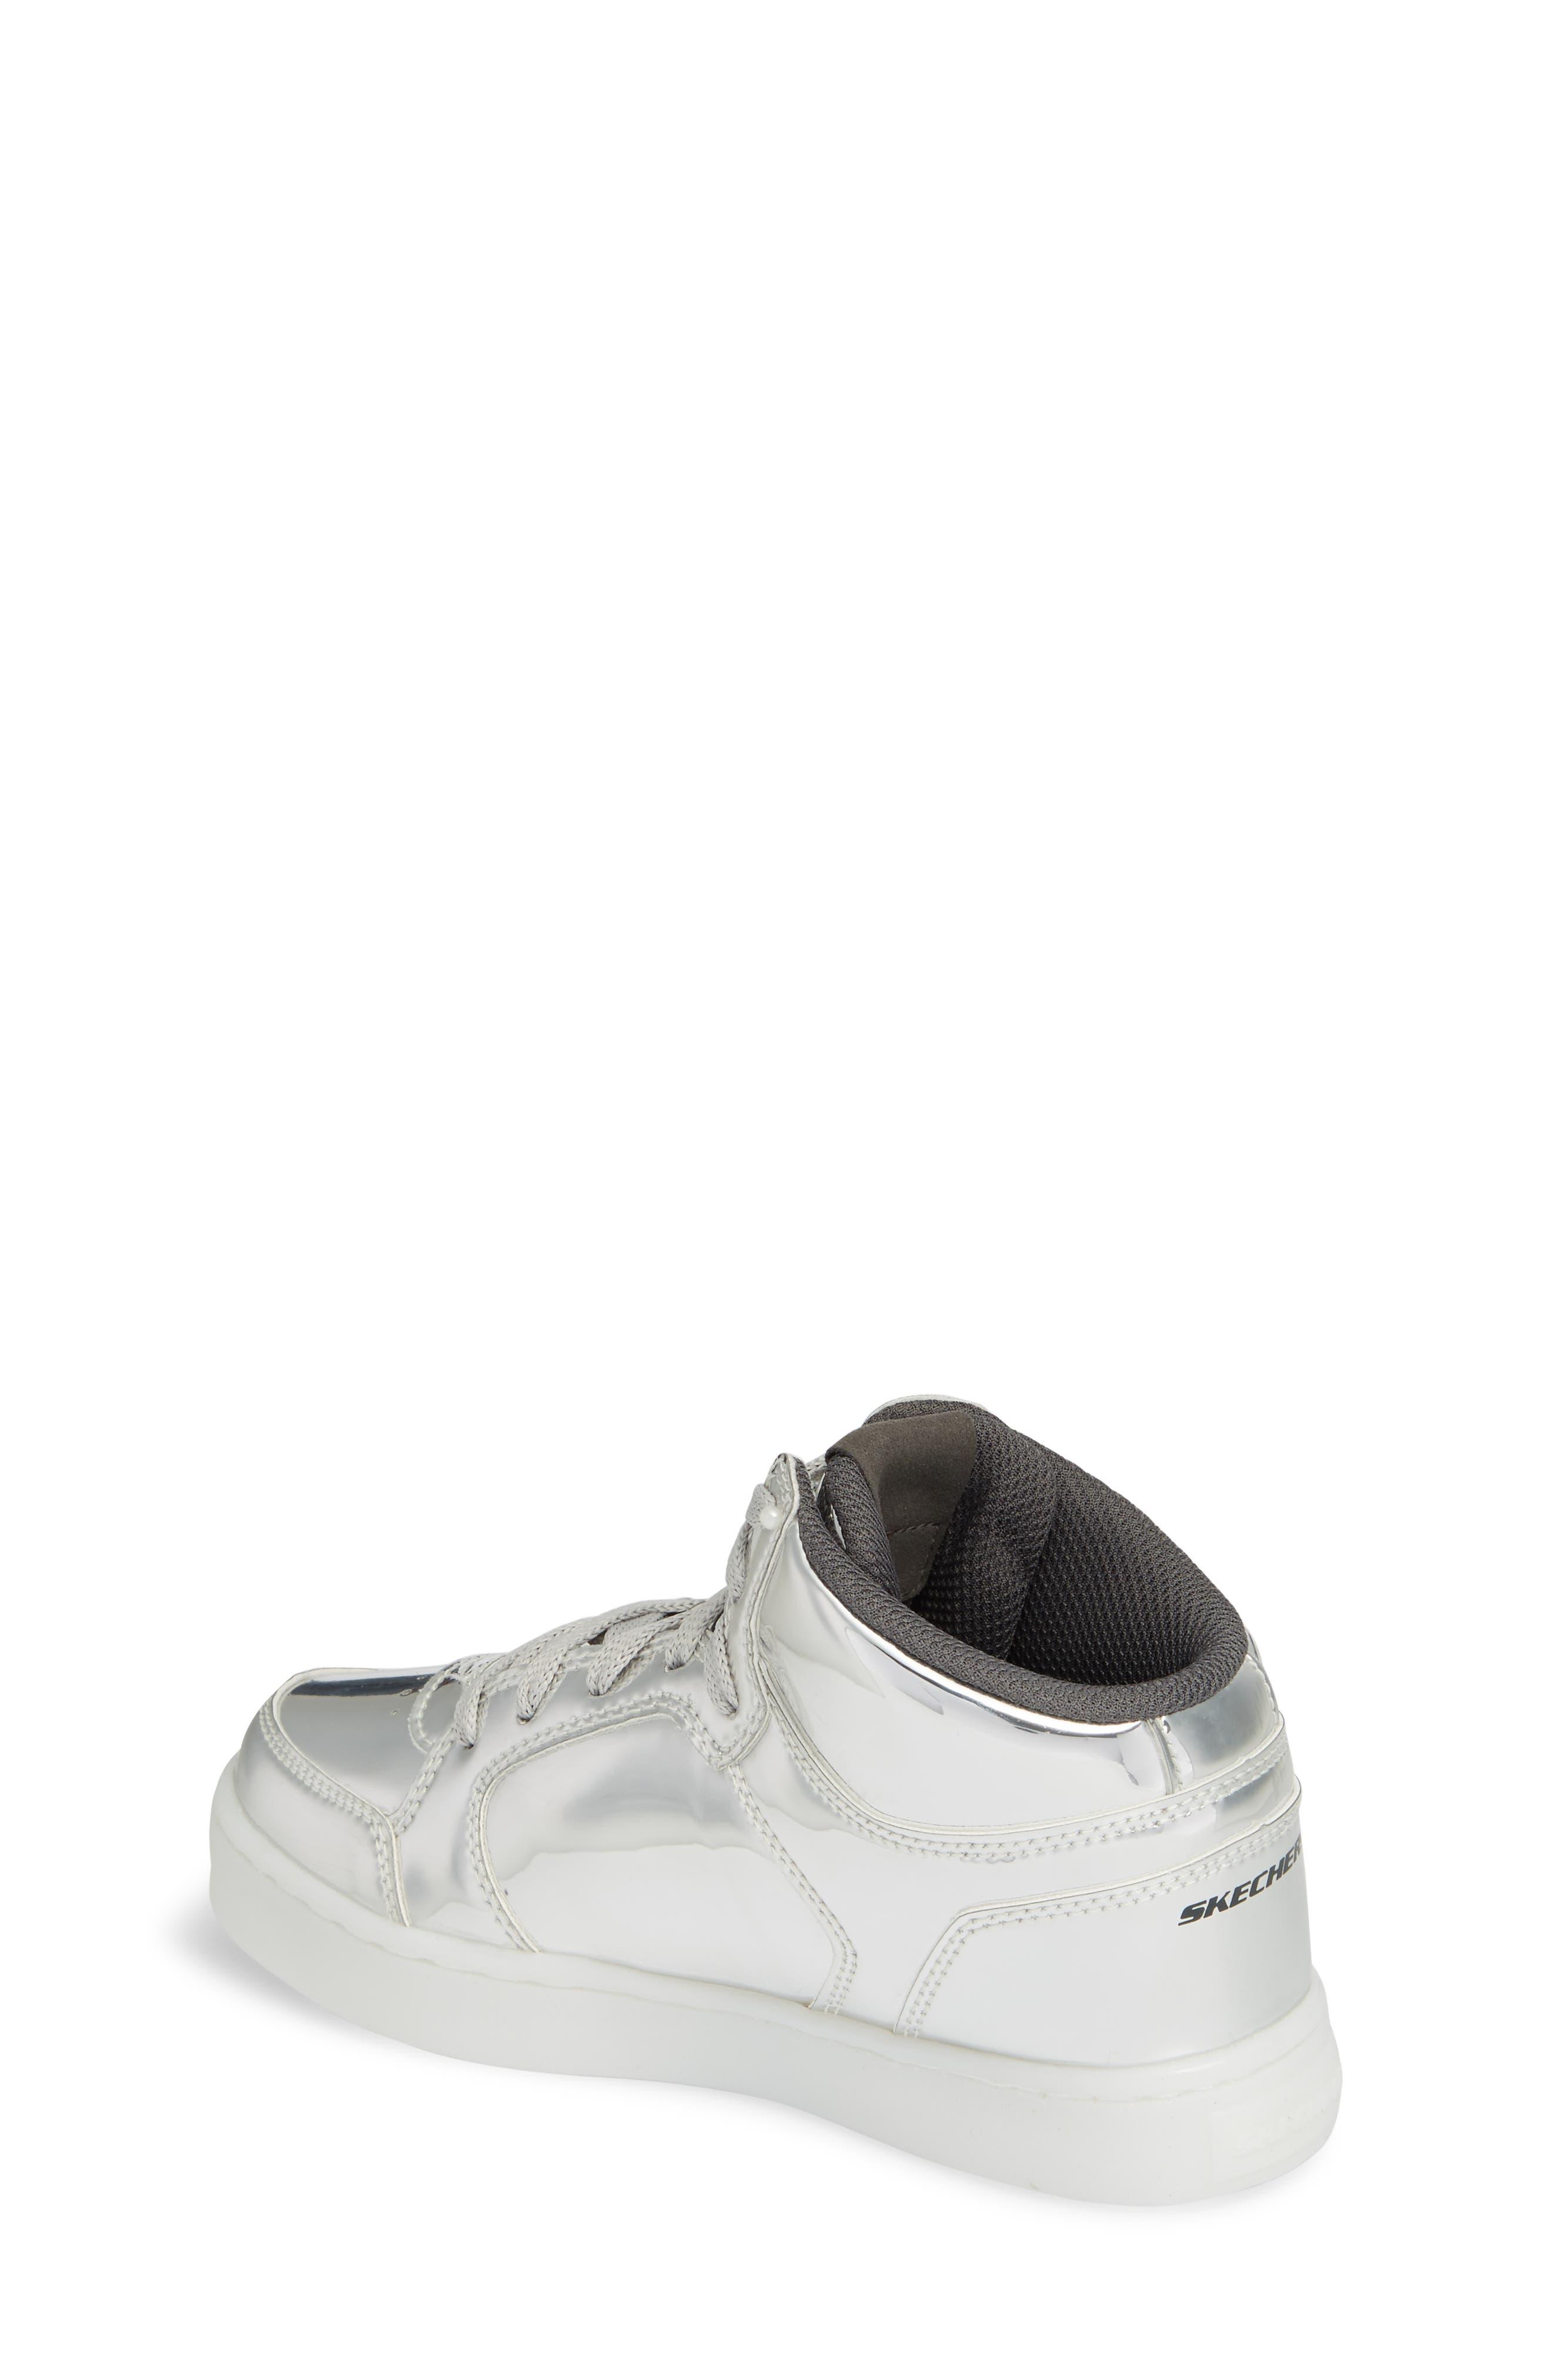 Energy Lights Metallic High Top Sneaker,                             Alternate thumbnail 6, color,